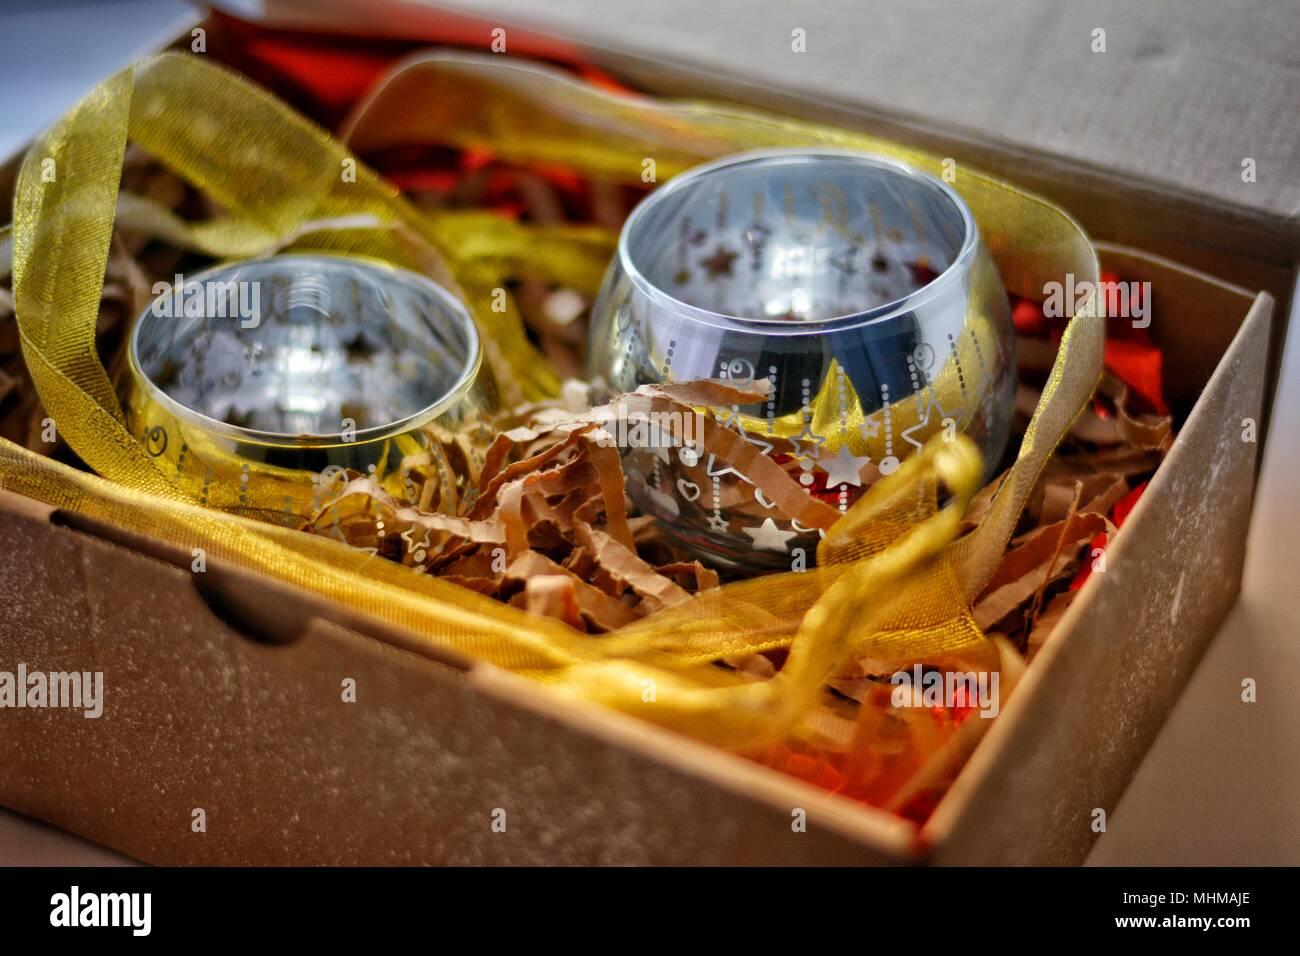 candlestick gift box - Stock Image